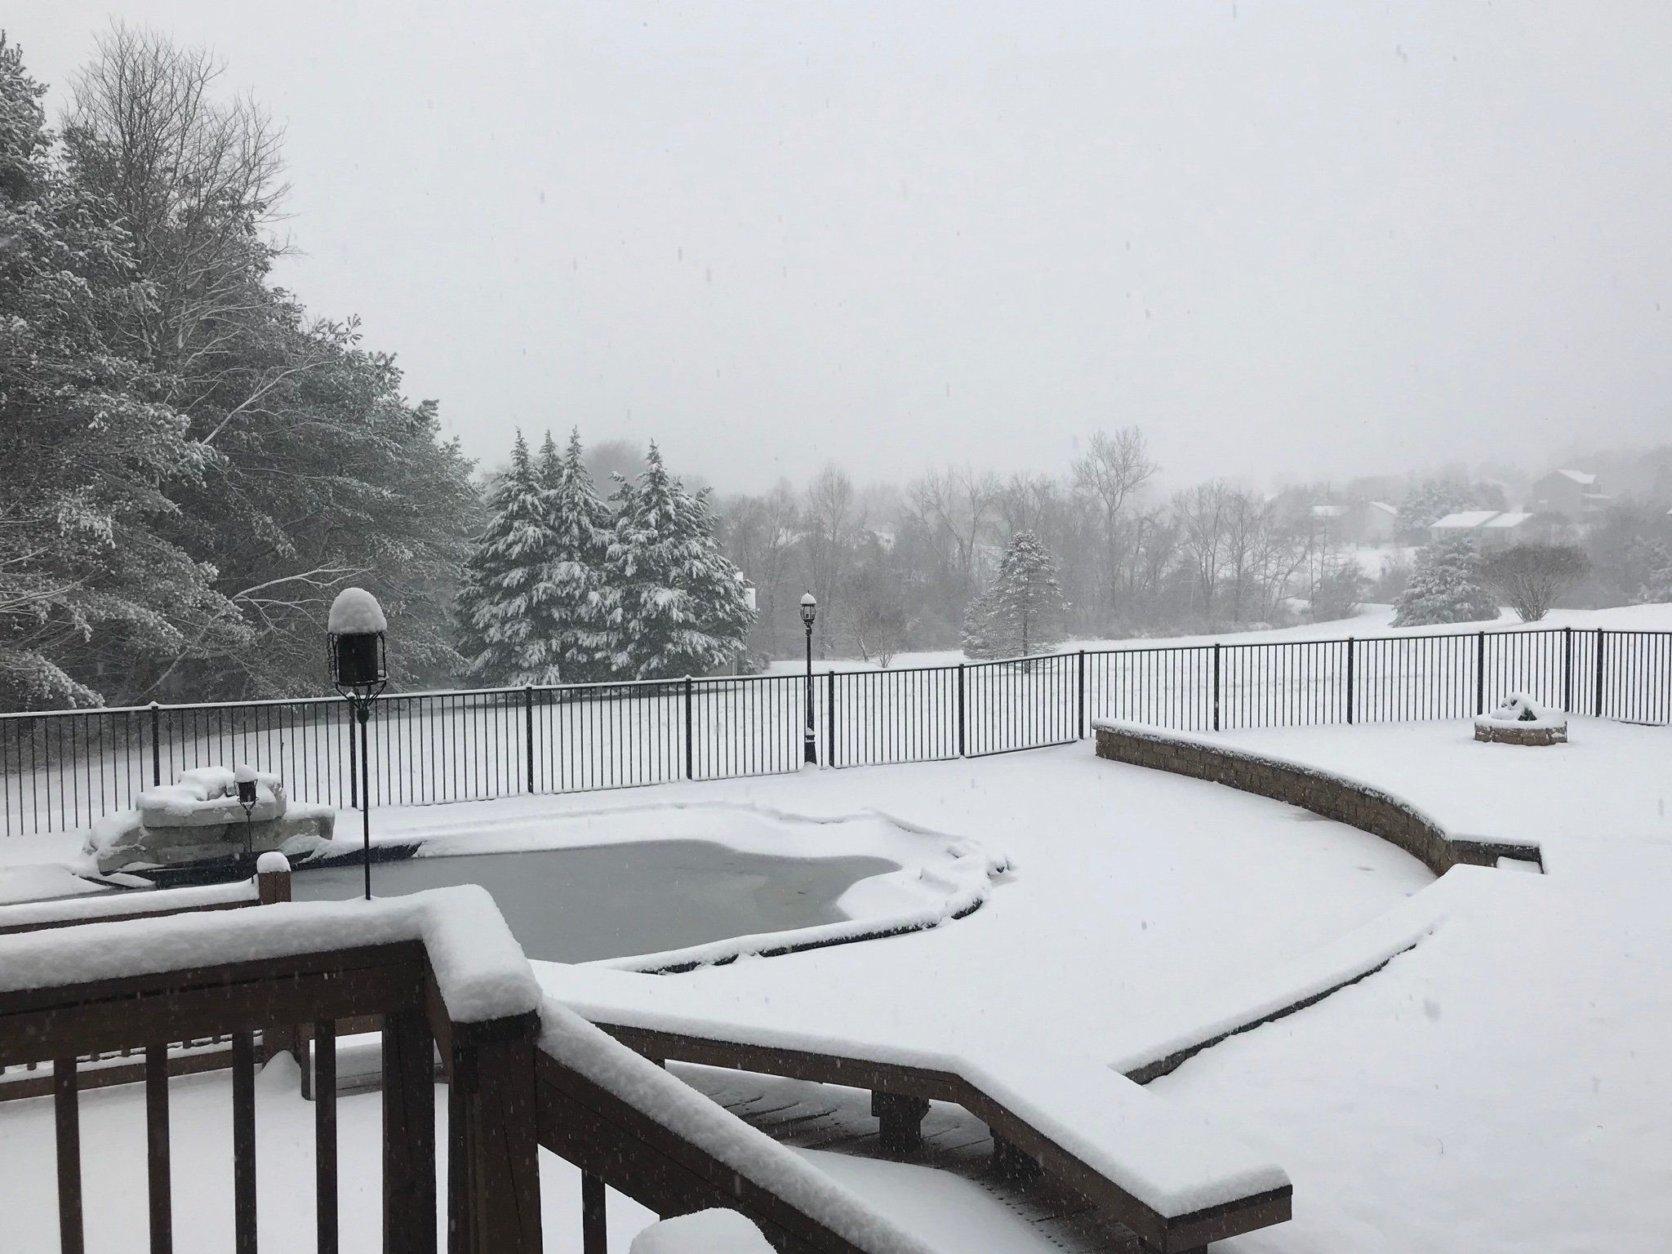 It's a winter wonderland in Culpeper, Virginia, on Wednesday morning. (Courtesy @RandiLutz via Twitter)